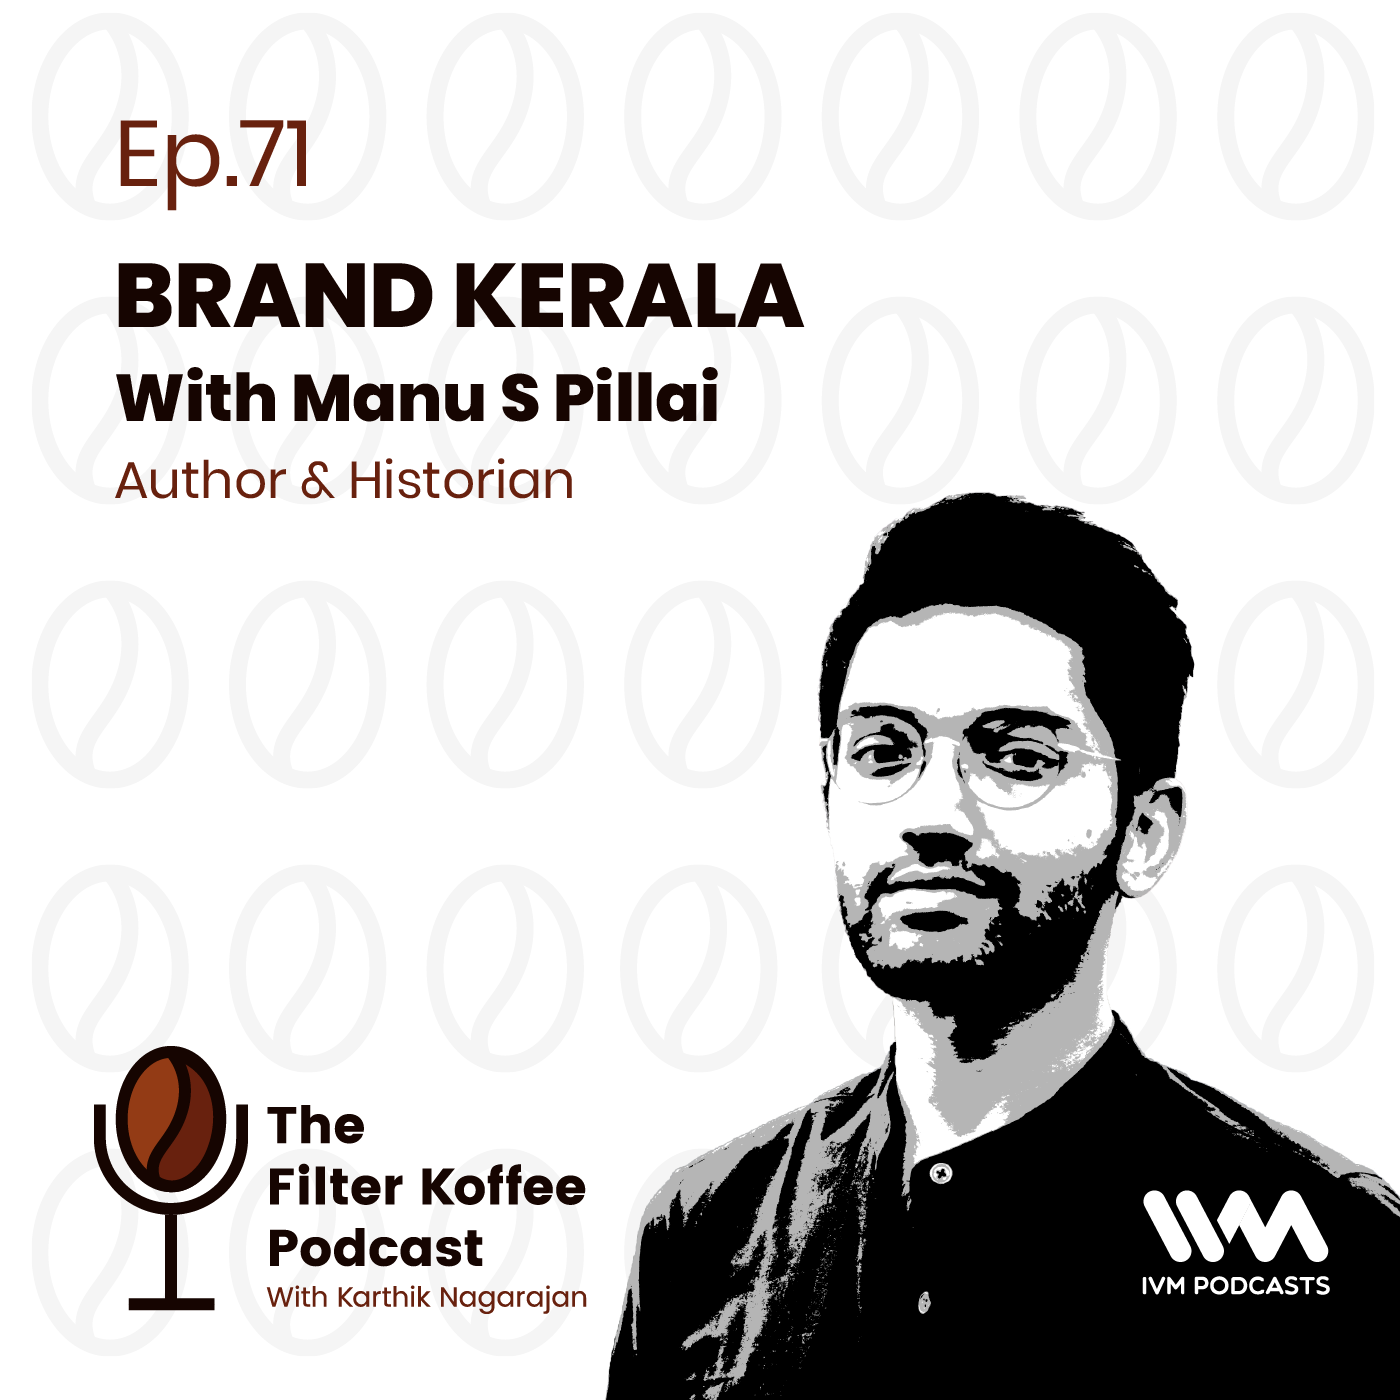 Ep. 71: Brand Kerala